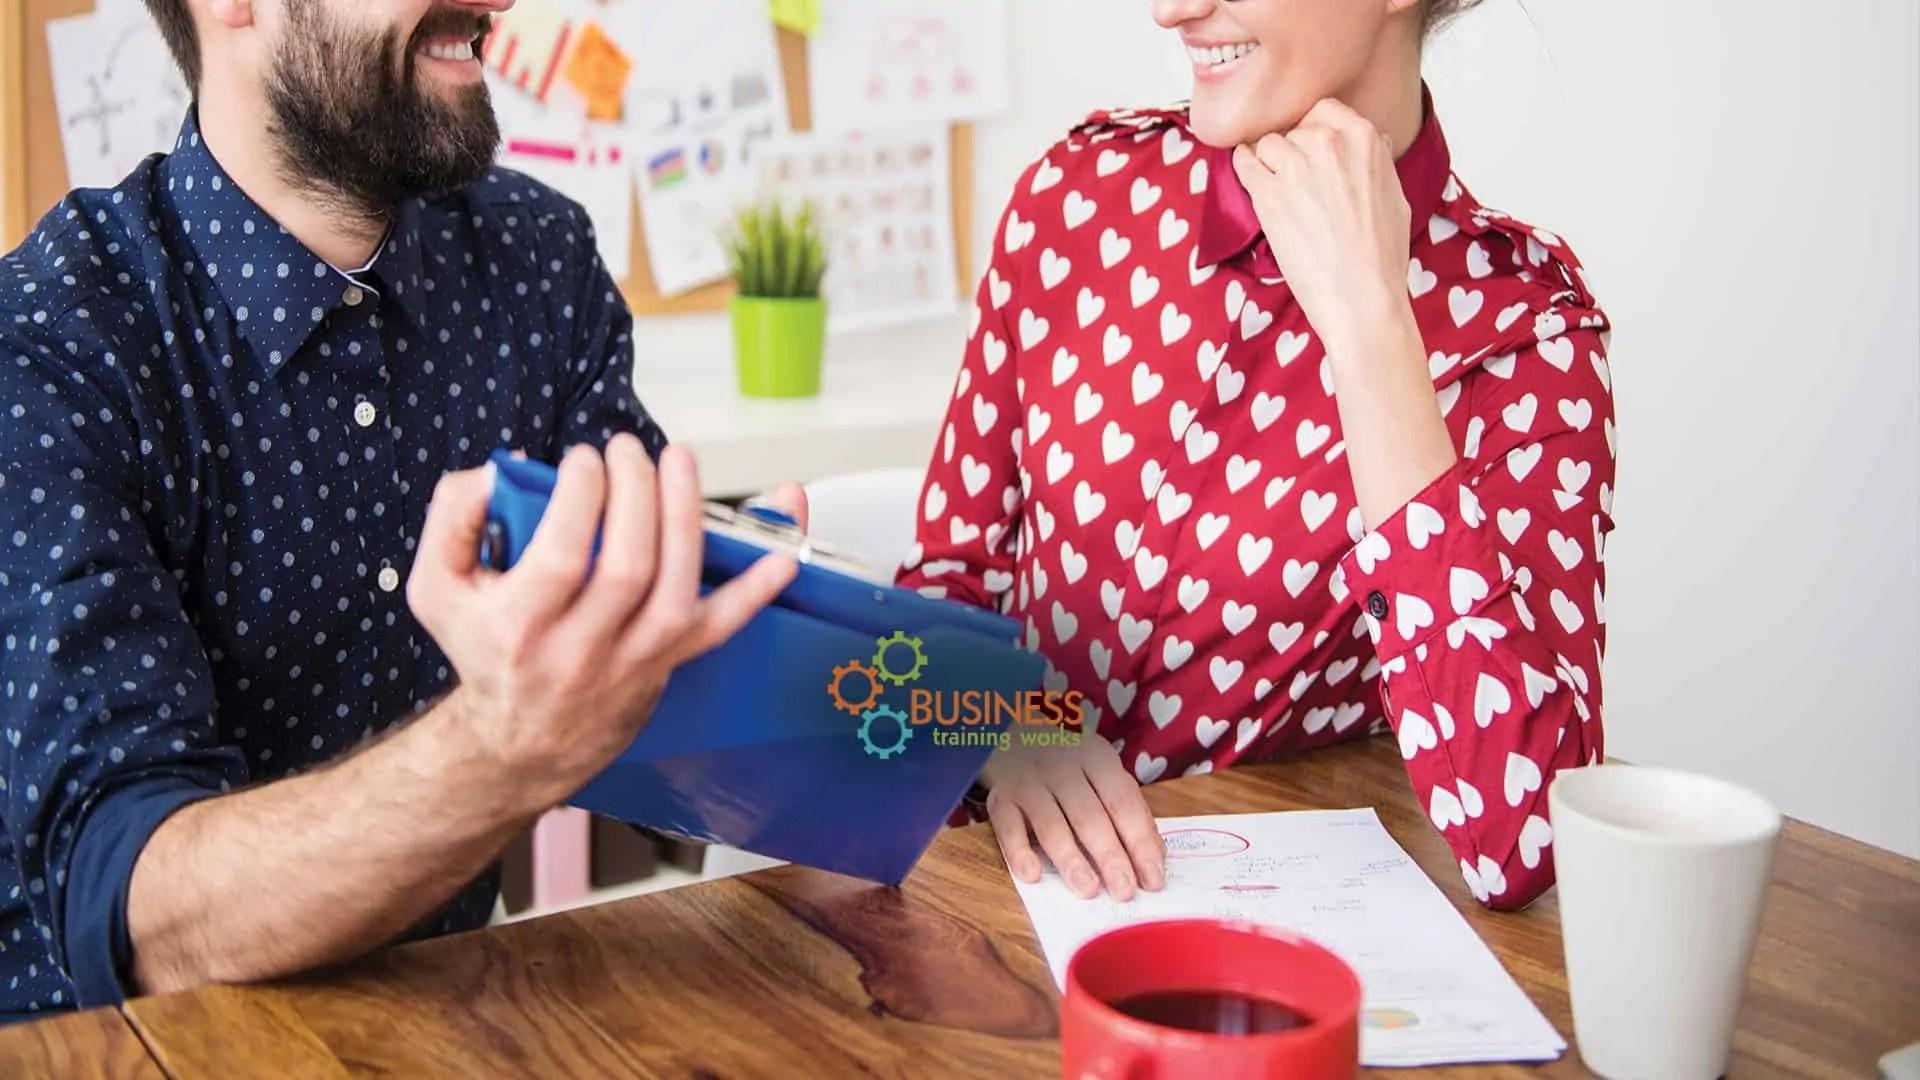 Web-Based Supervision Skills Training Course